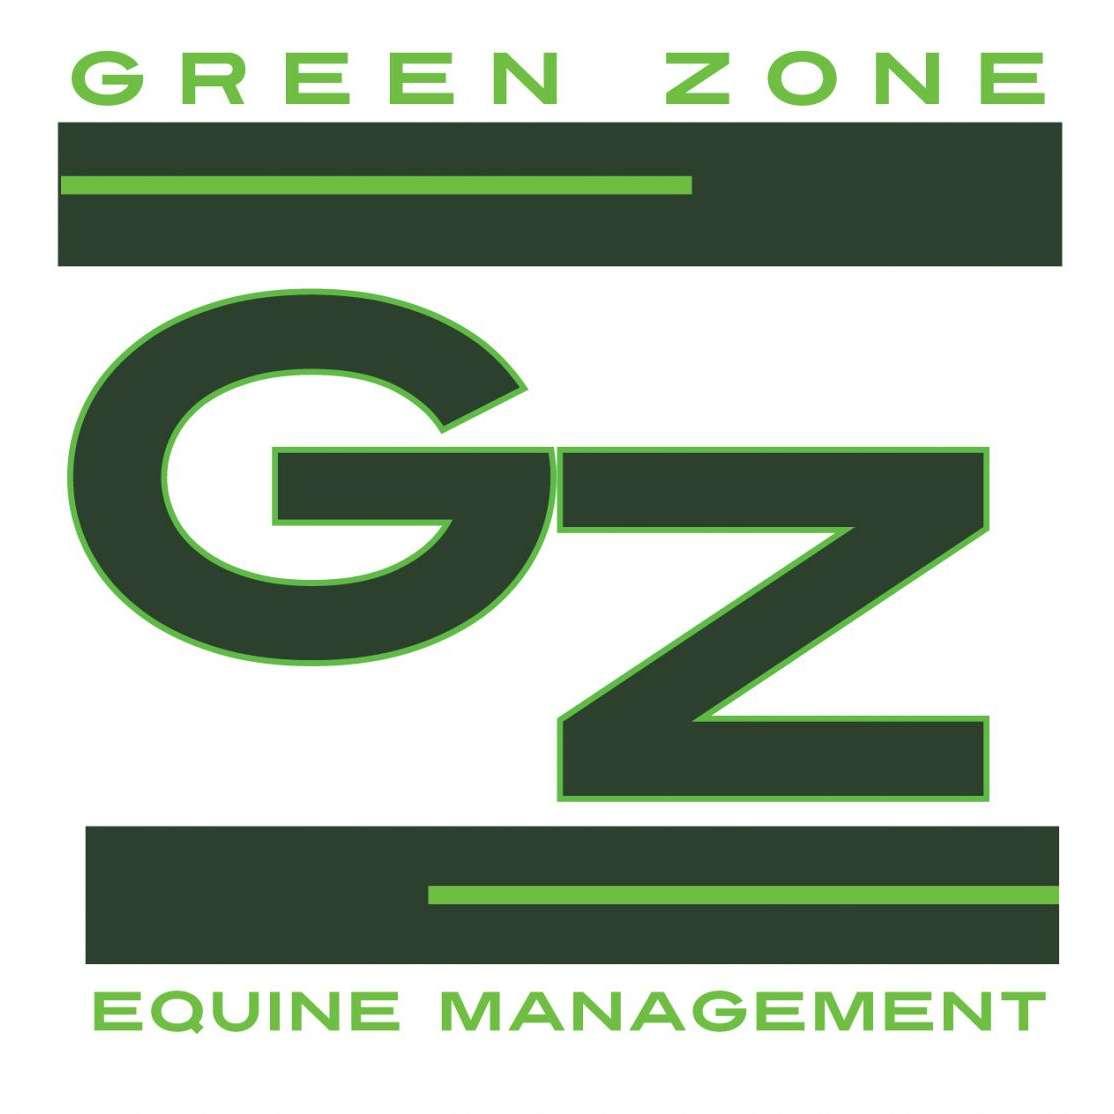 Green Zone Equine Management